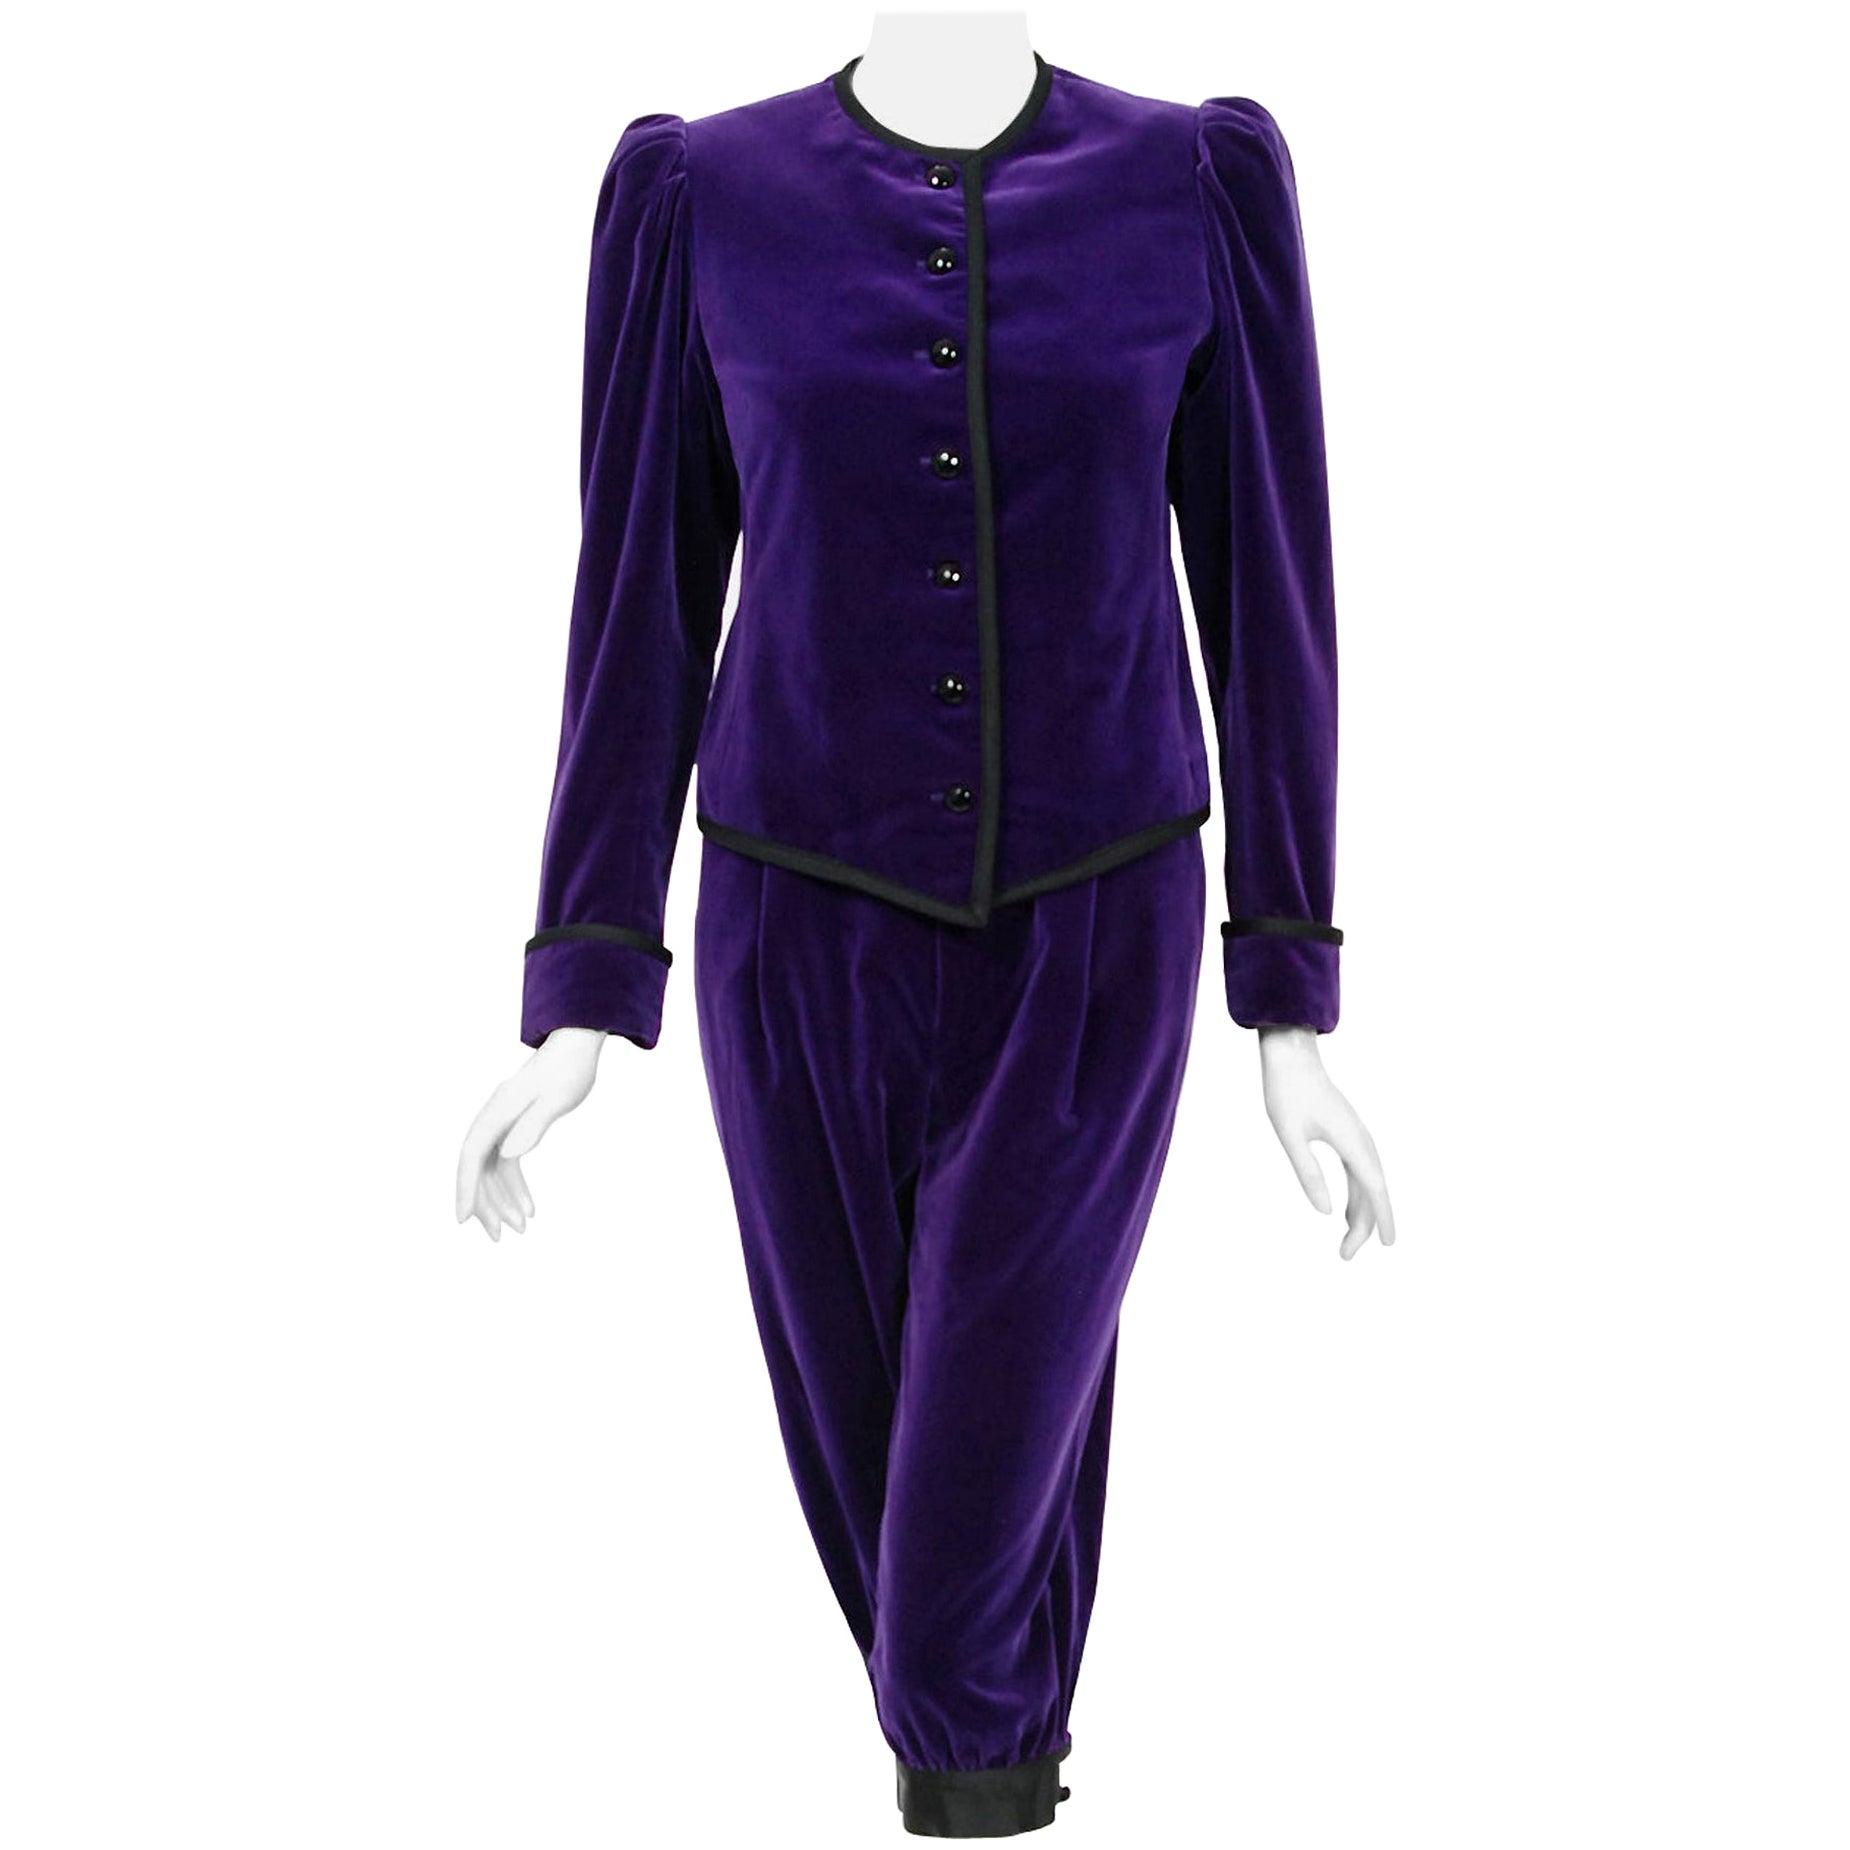 Vintage 1979 Yves Saint Laurent Documented Purple Velvet Jacket Knicker Pantsuit